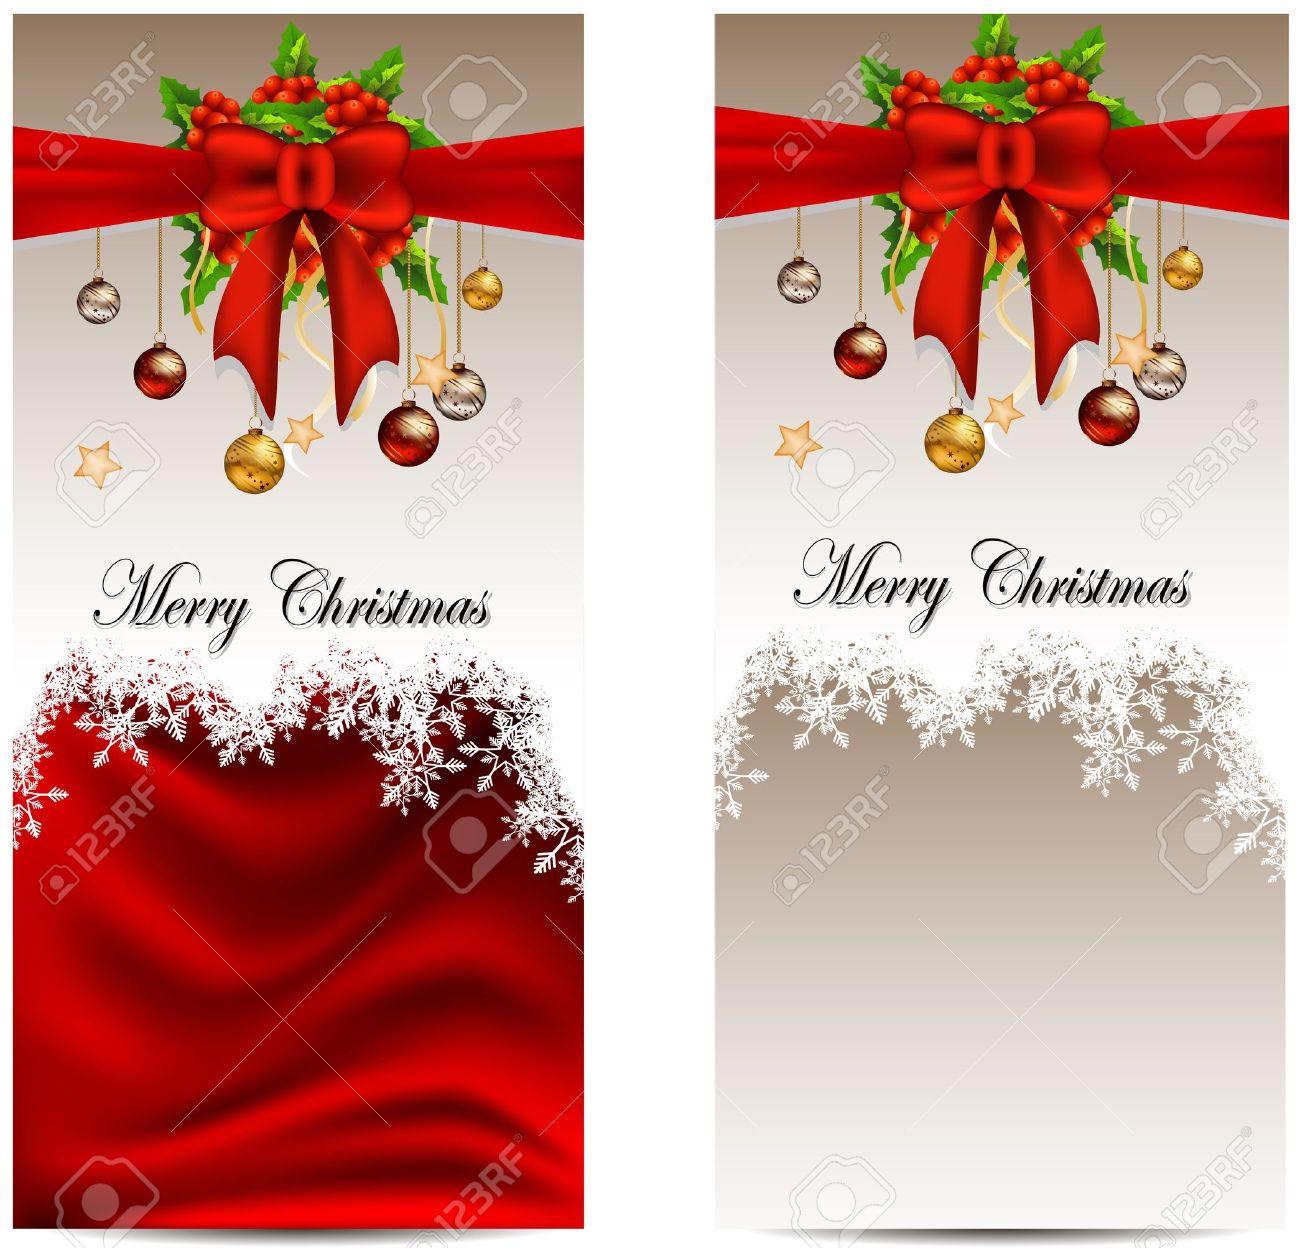 Free Christmas Card Email Templates christian preschool director – Christmas Cards Sample